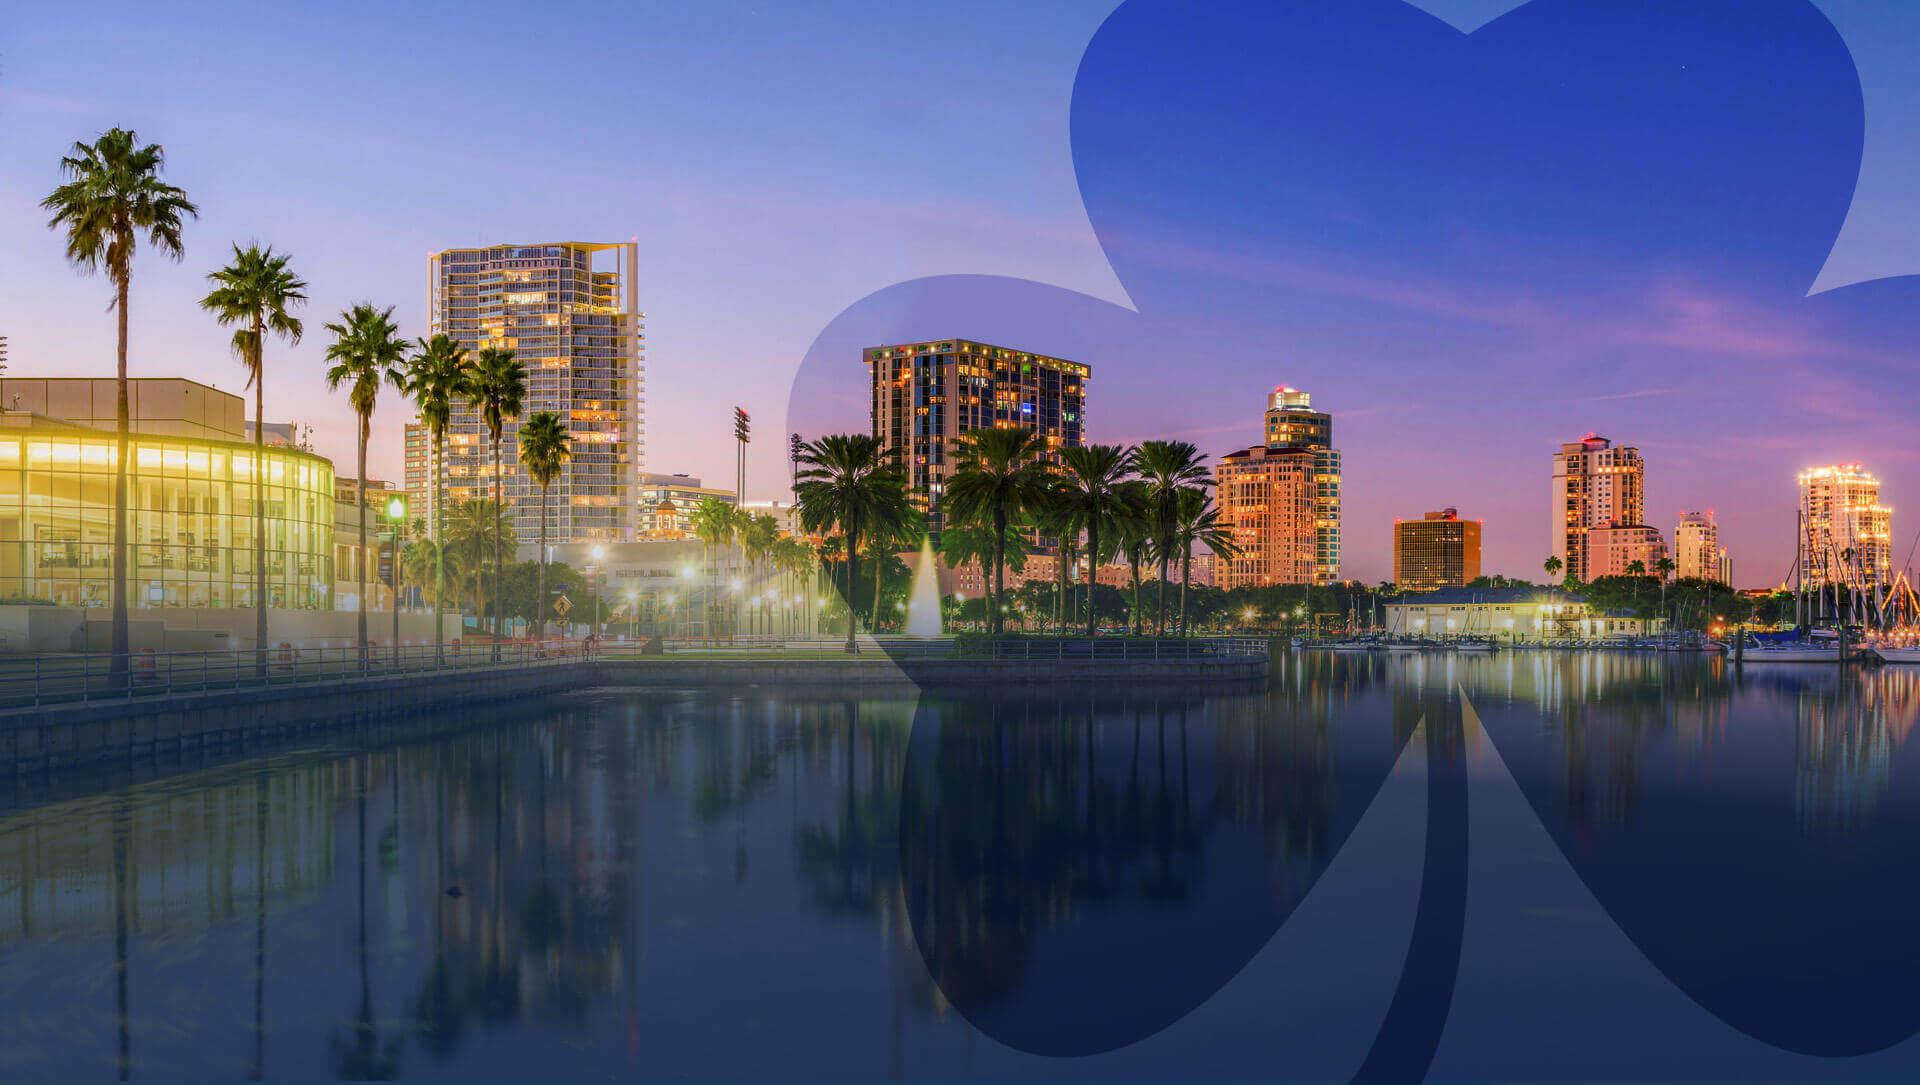 St. Petersburg, Florida skyline at night